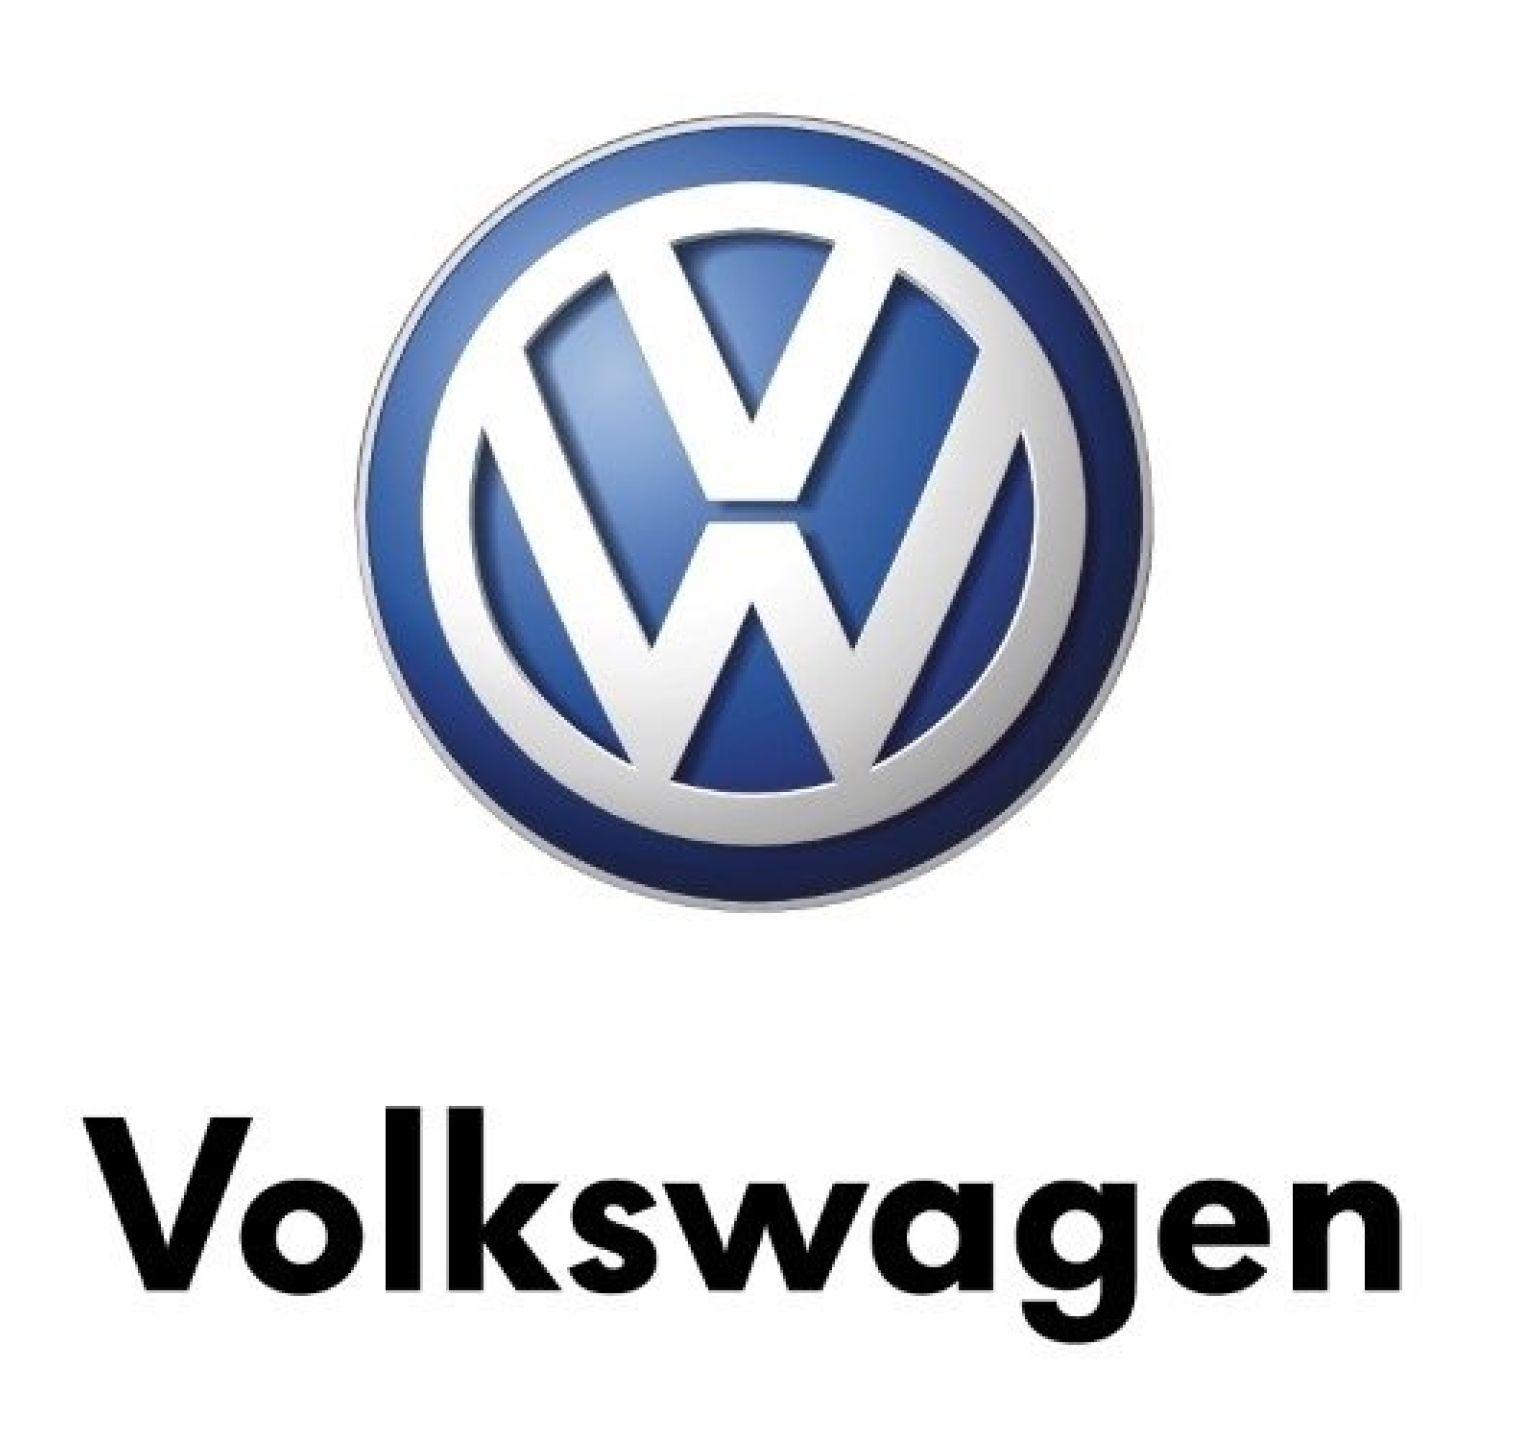 Volkswagen (VW) Golf Van VI Variant (2009 t/m 2014) - set ruitenwissers Valeo Silencio flatblade